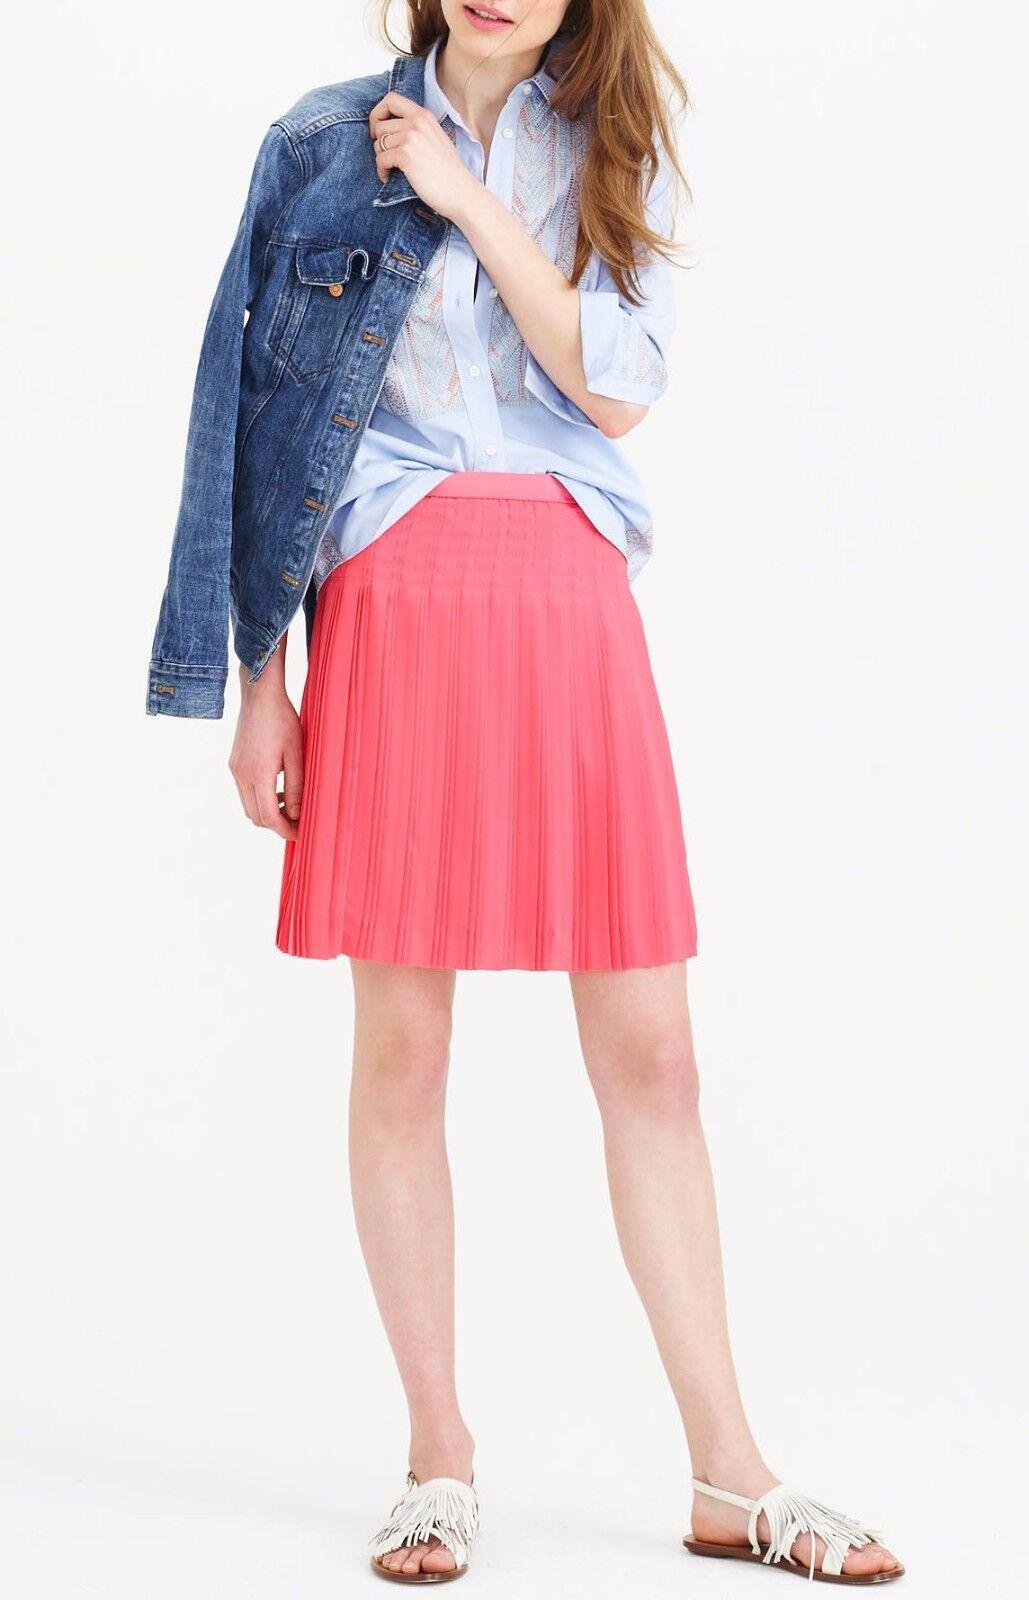 110 New J.Crew Stitched-Down Pleated Mini A-Line Skirt Wildflower Pink 2 XS